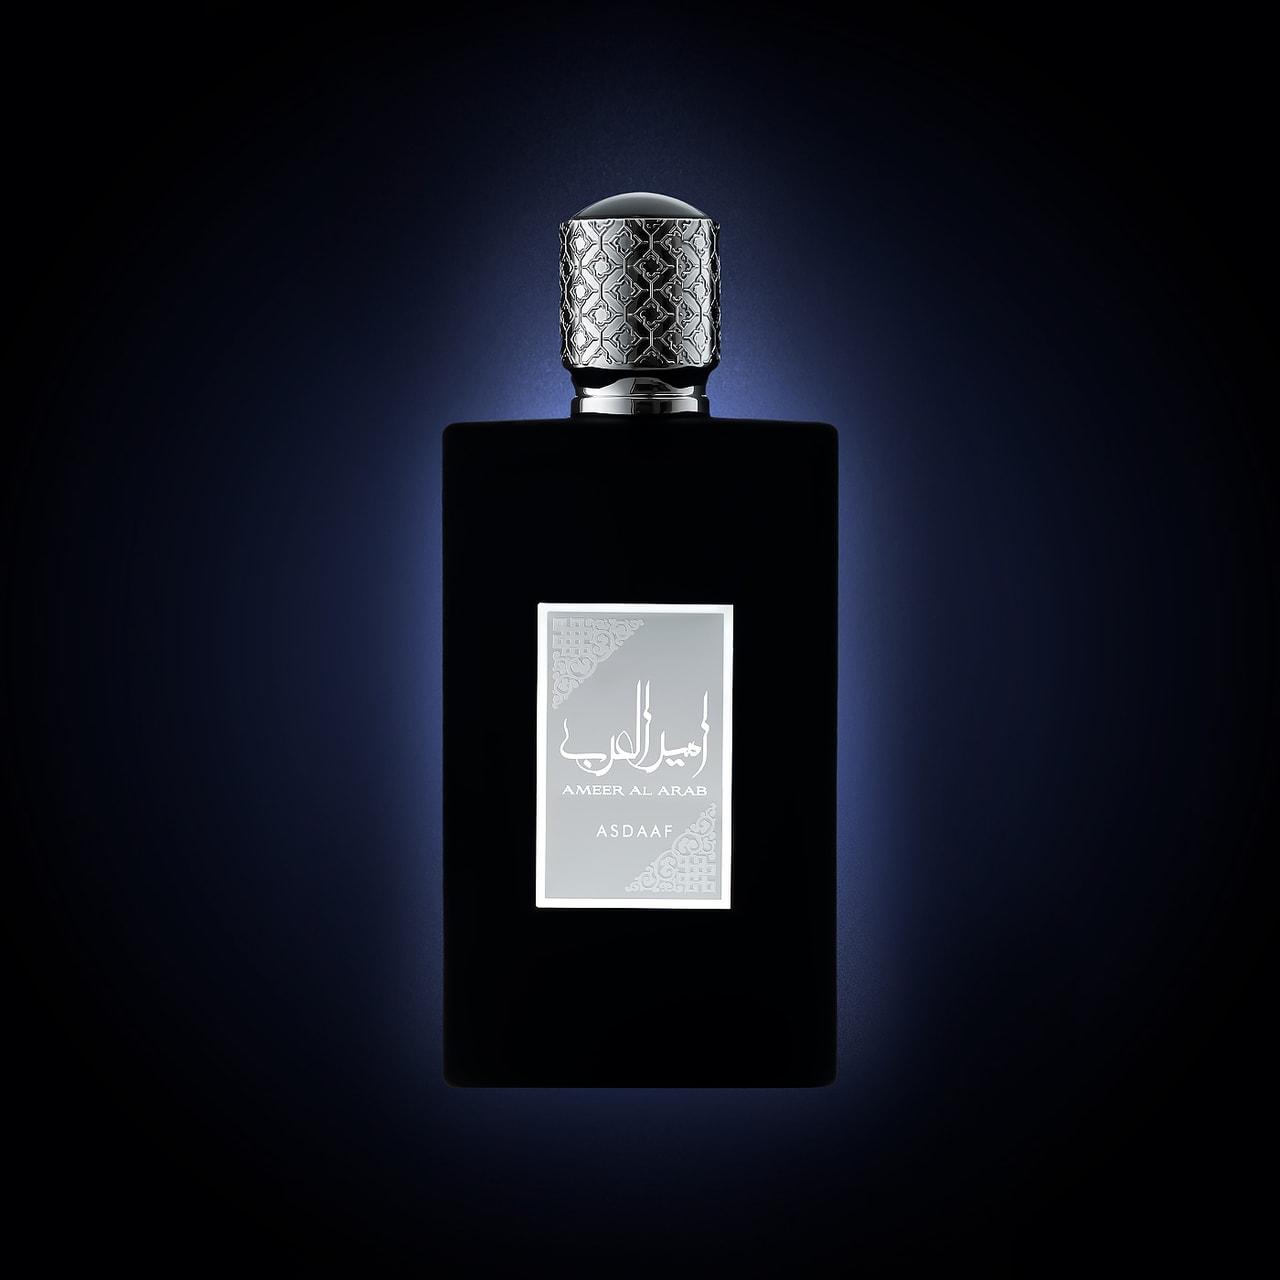 Fotografie de produs-parfum-Rada-fundal negru